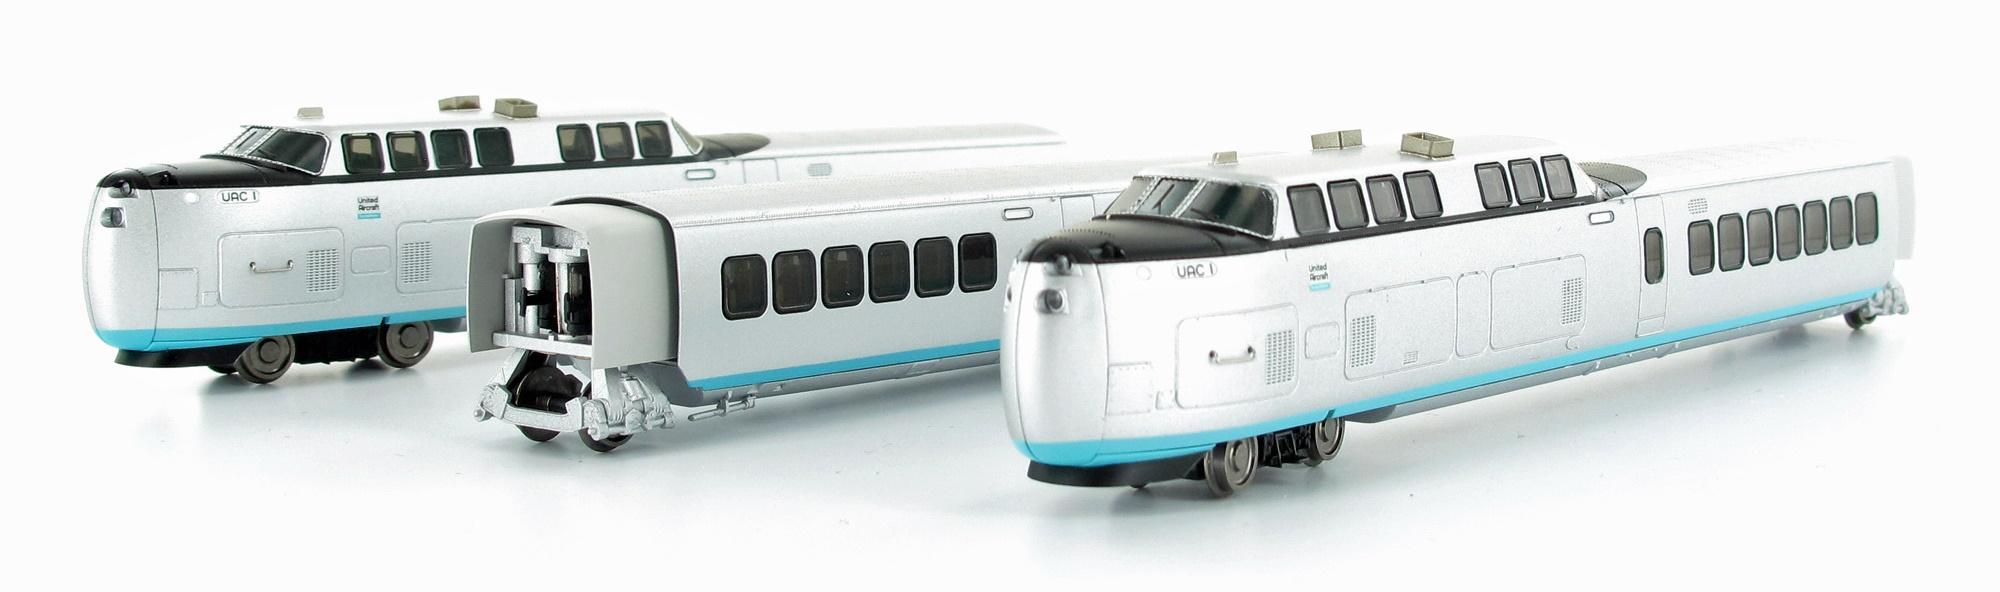 N Scale - Rapido Trains - 520501 - Passenger Train, TurboTrain - United Aircraft